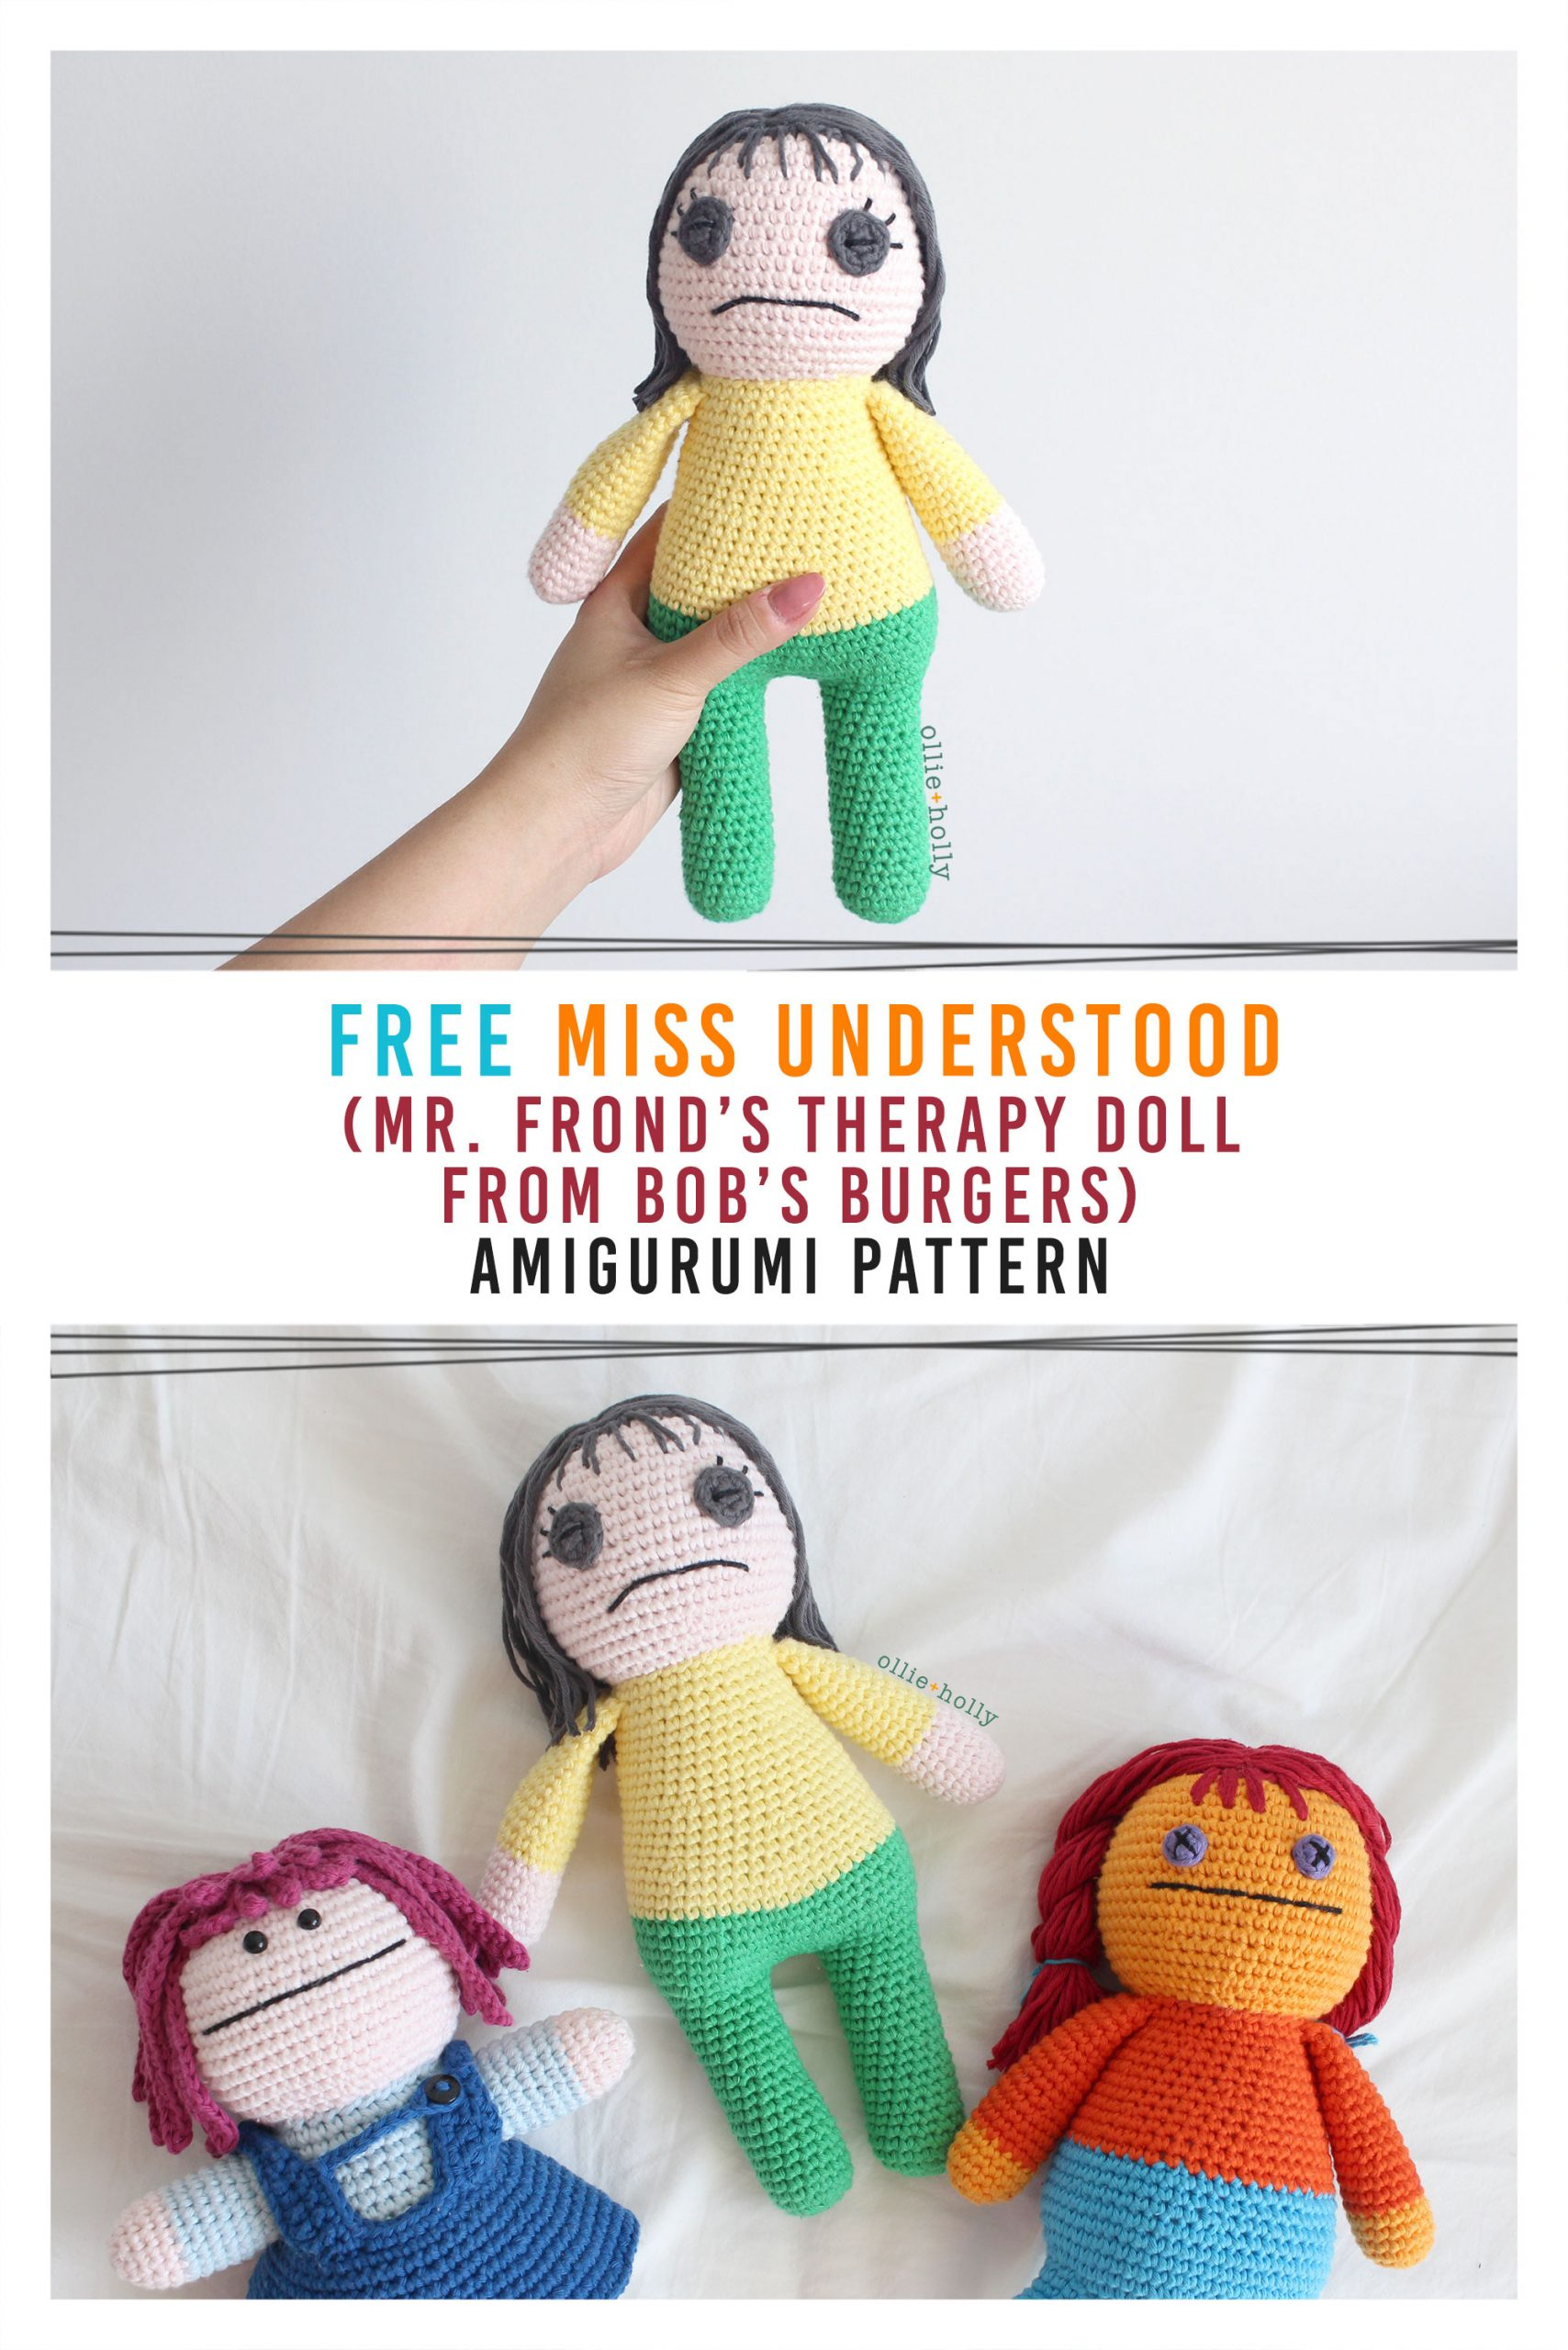 Free Miss Understood (Mr. Frond's Therapy Dolls from Bob's Burgers) Amigurumi Crochet Pattern